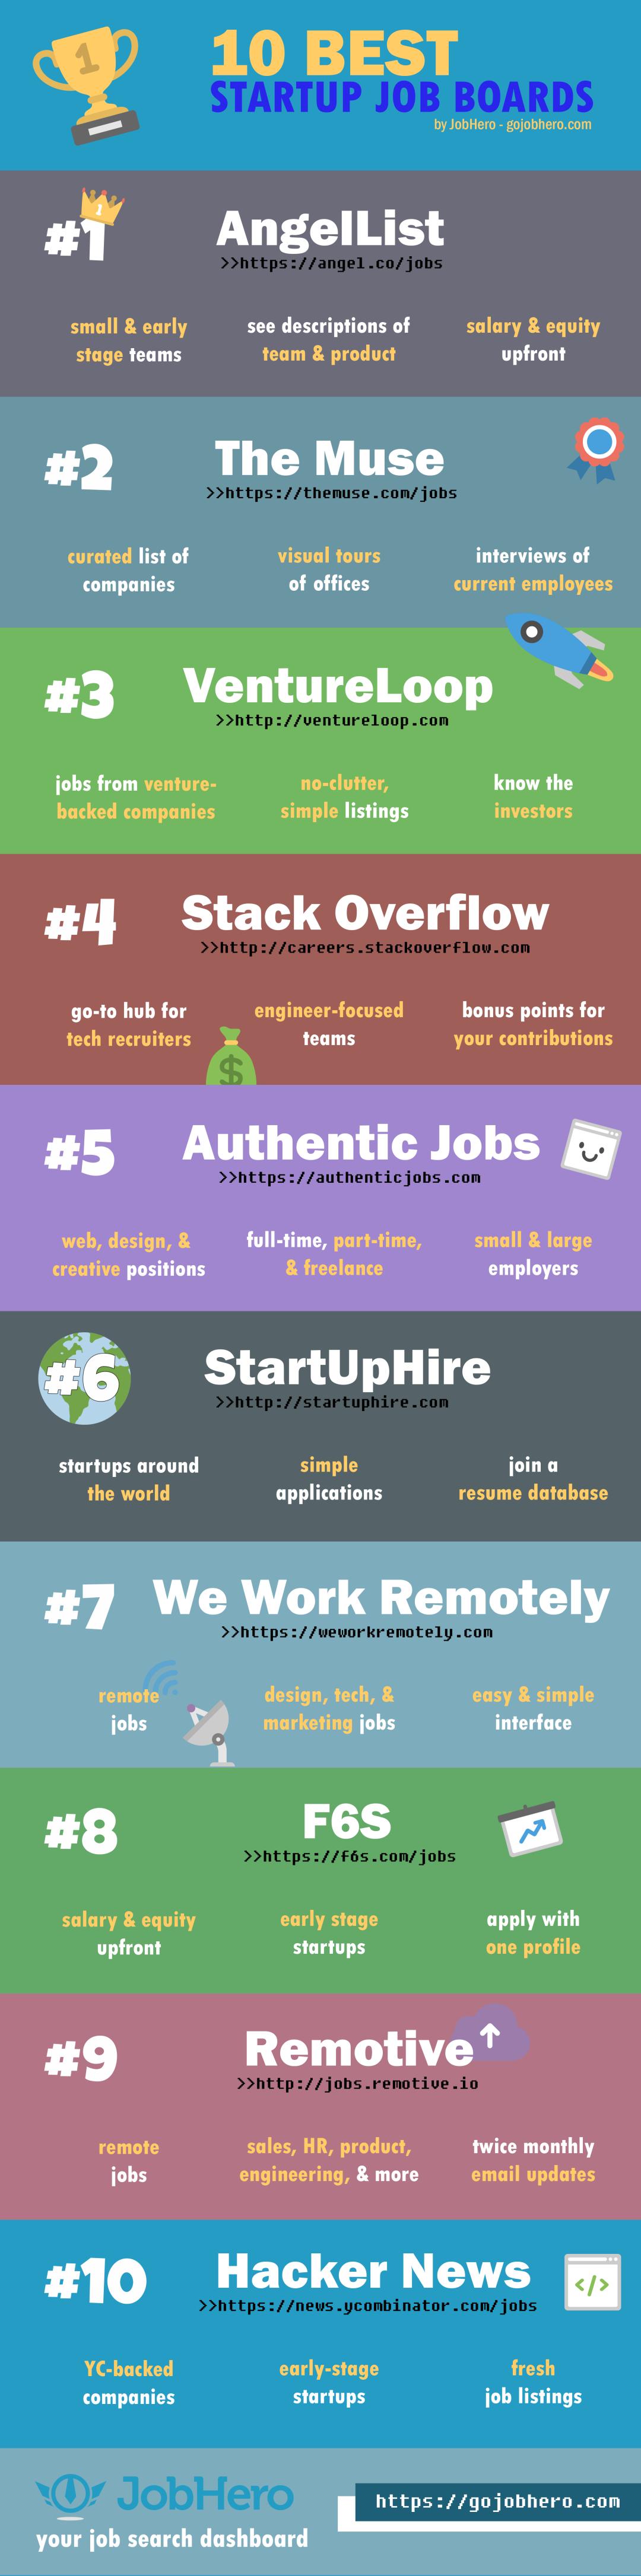 jobhero_infographic_best_startup_jobs